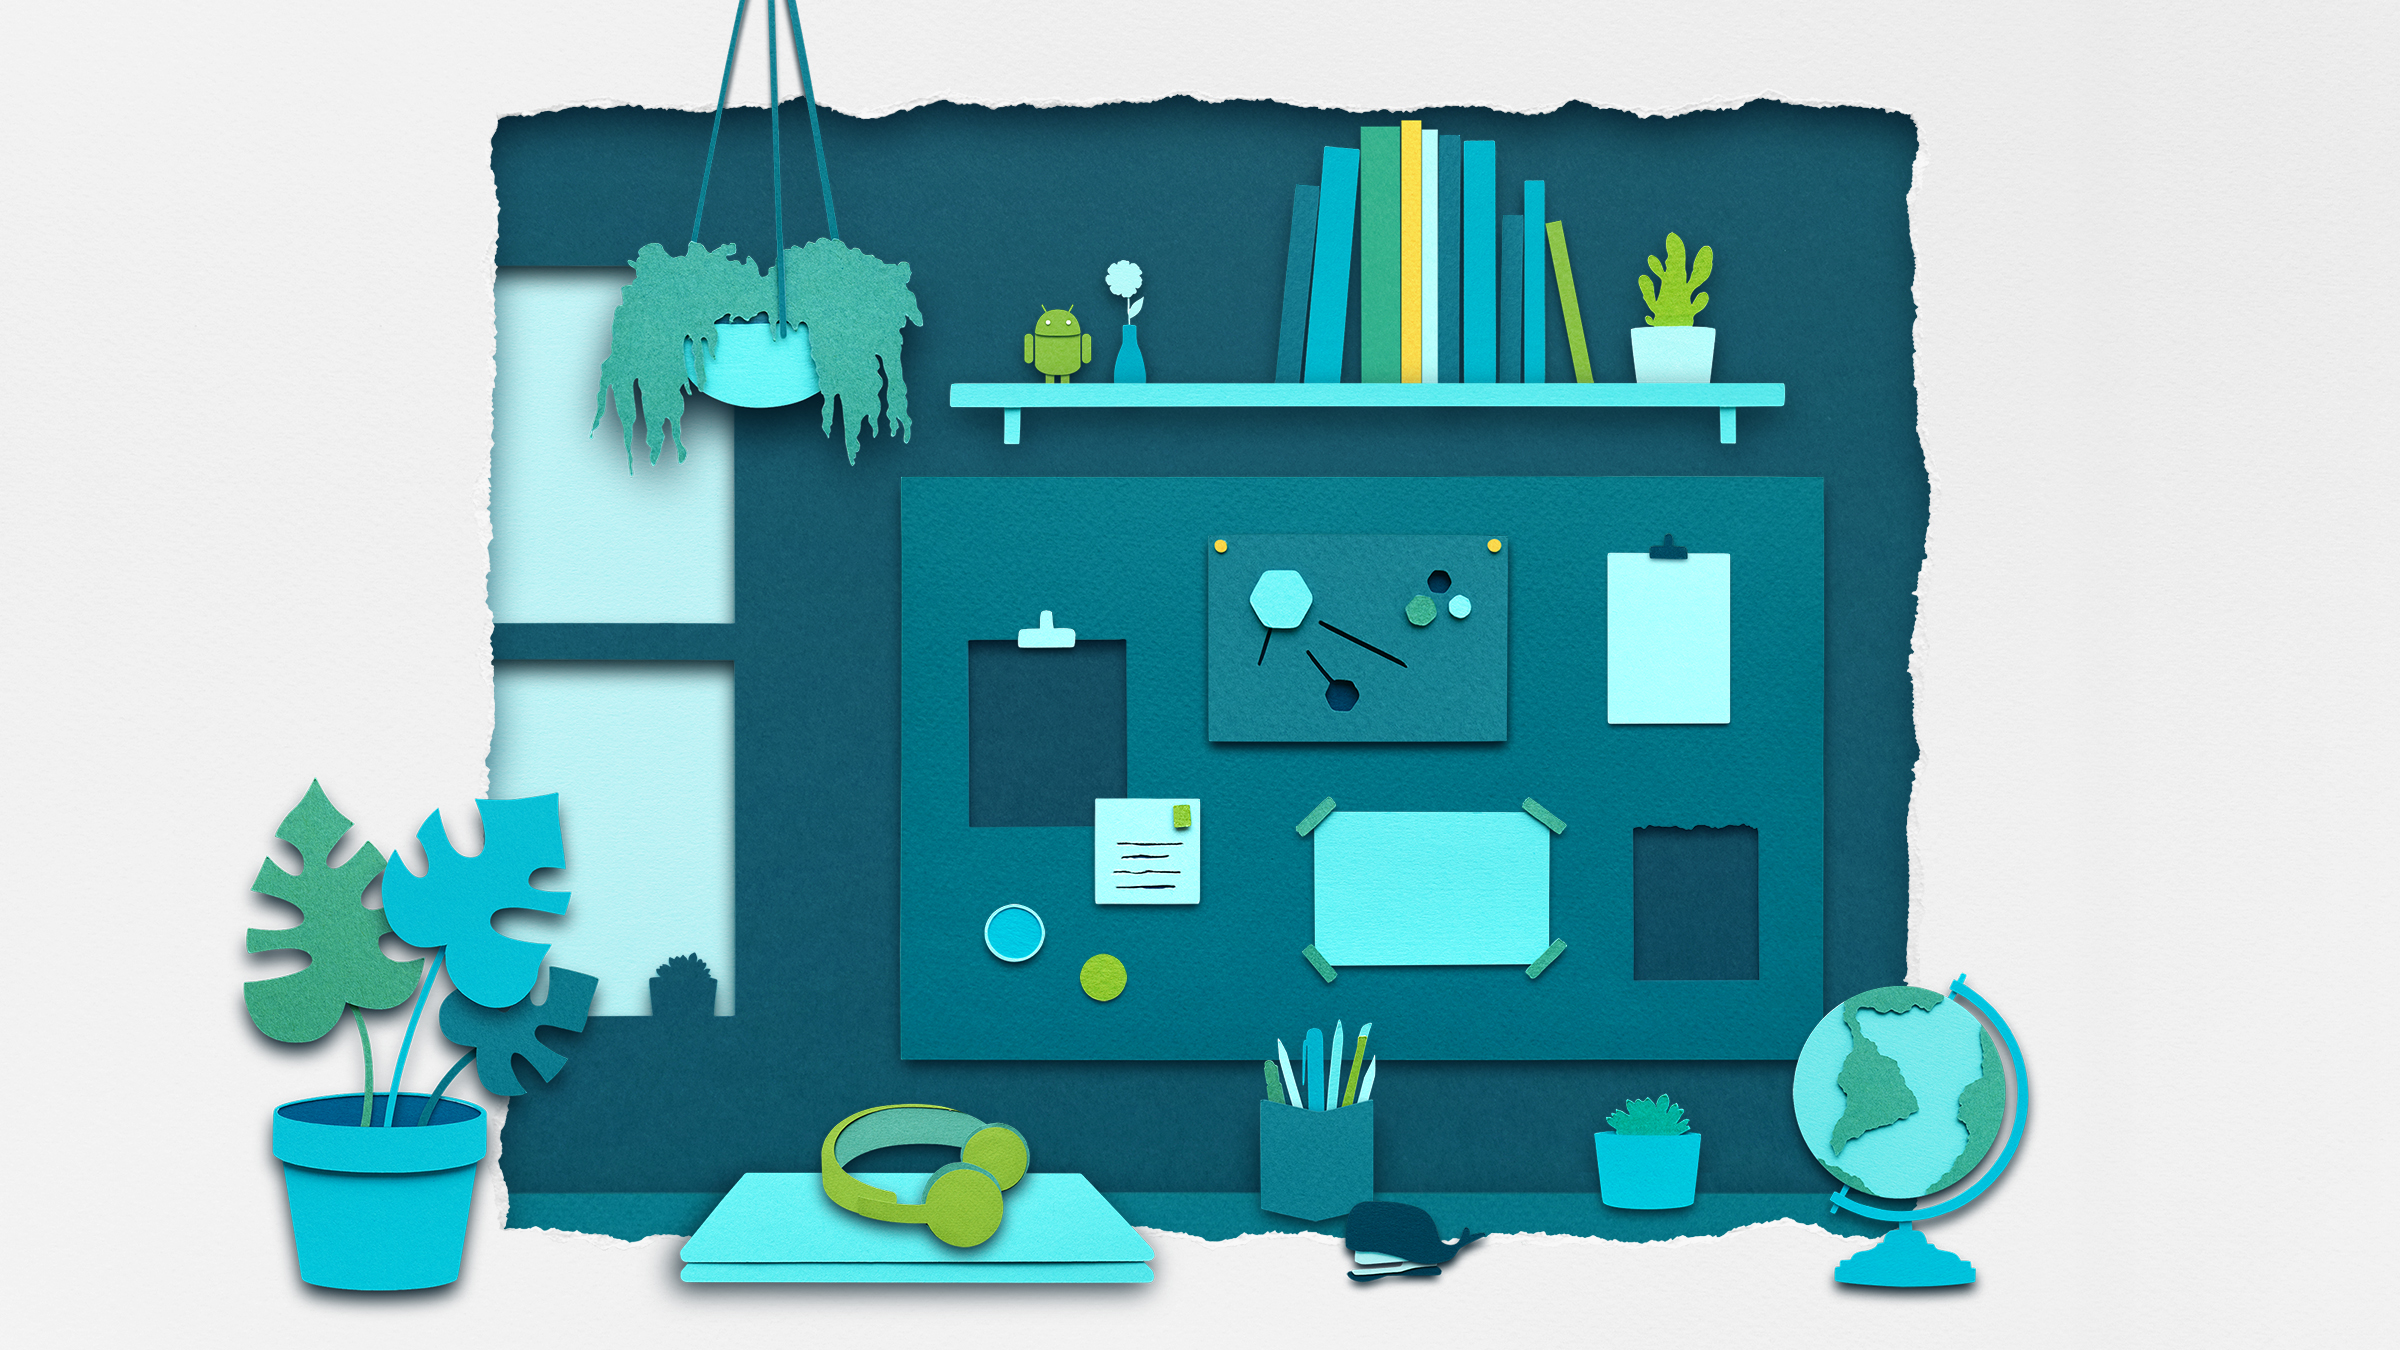 Google Primer: Product design & brand relaunch